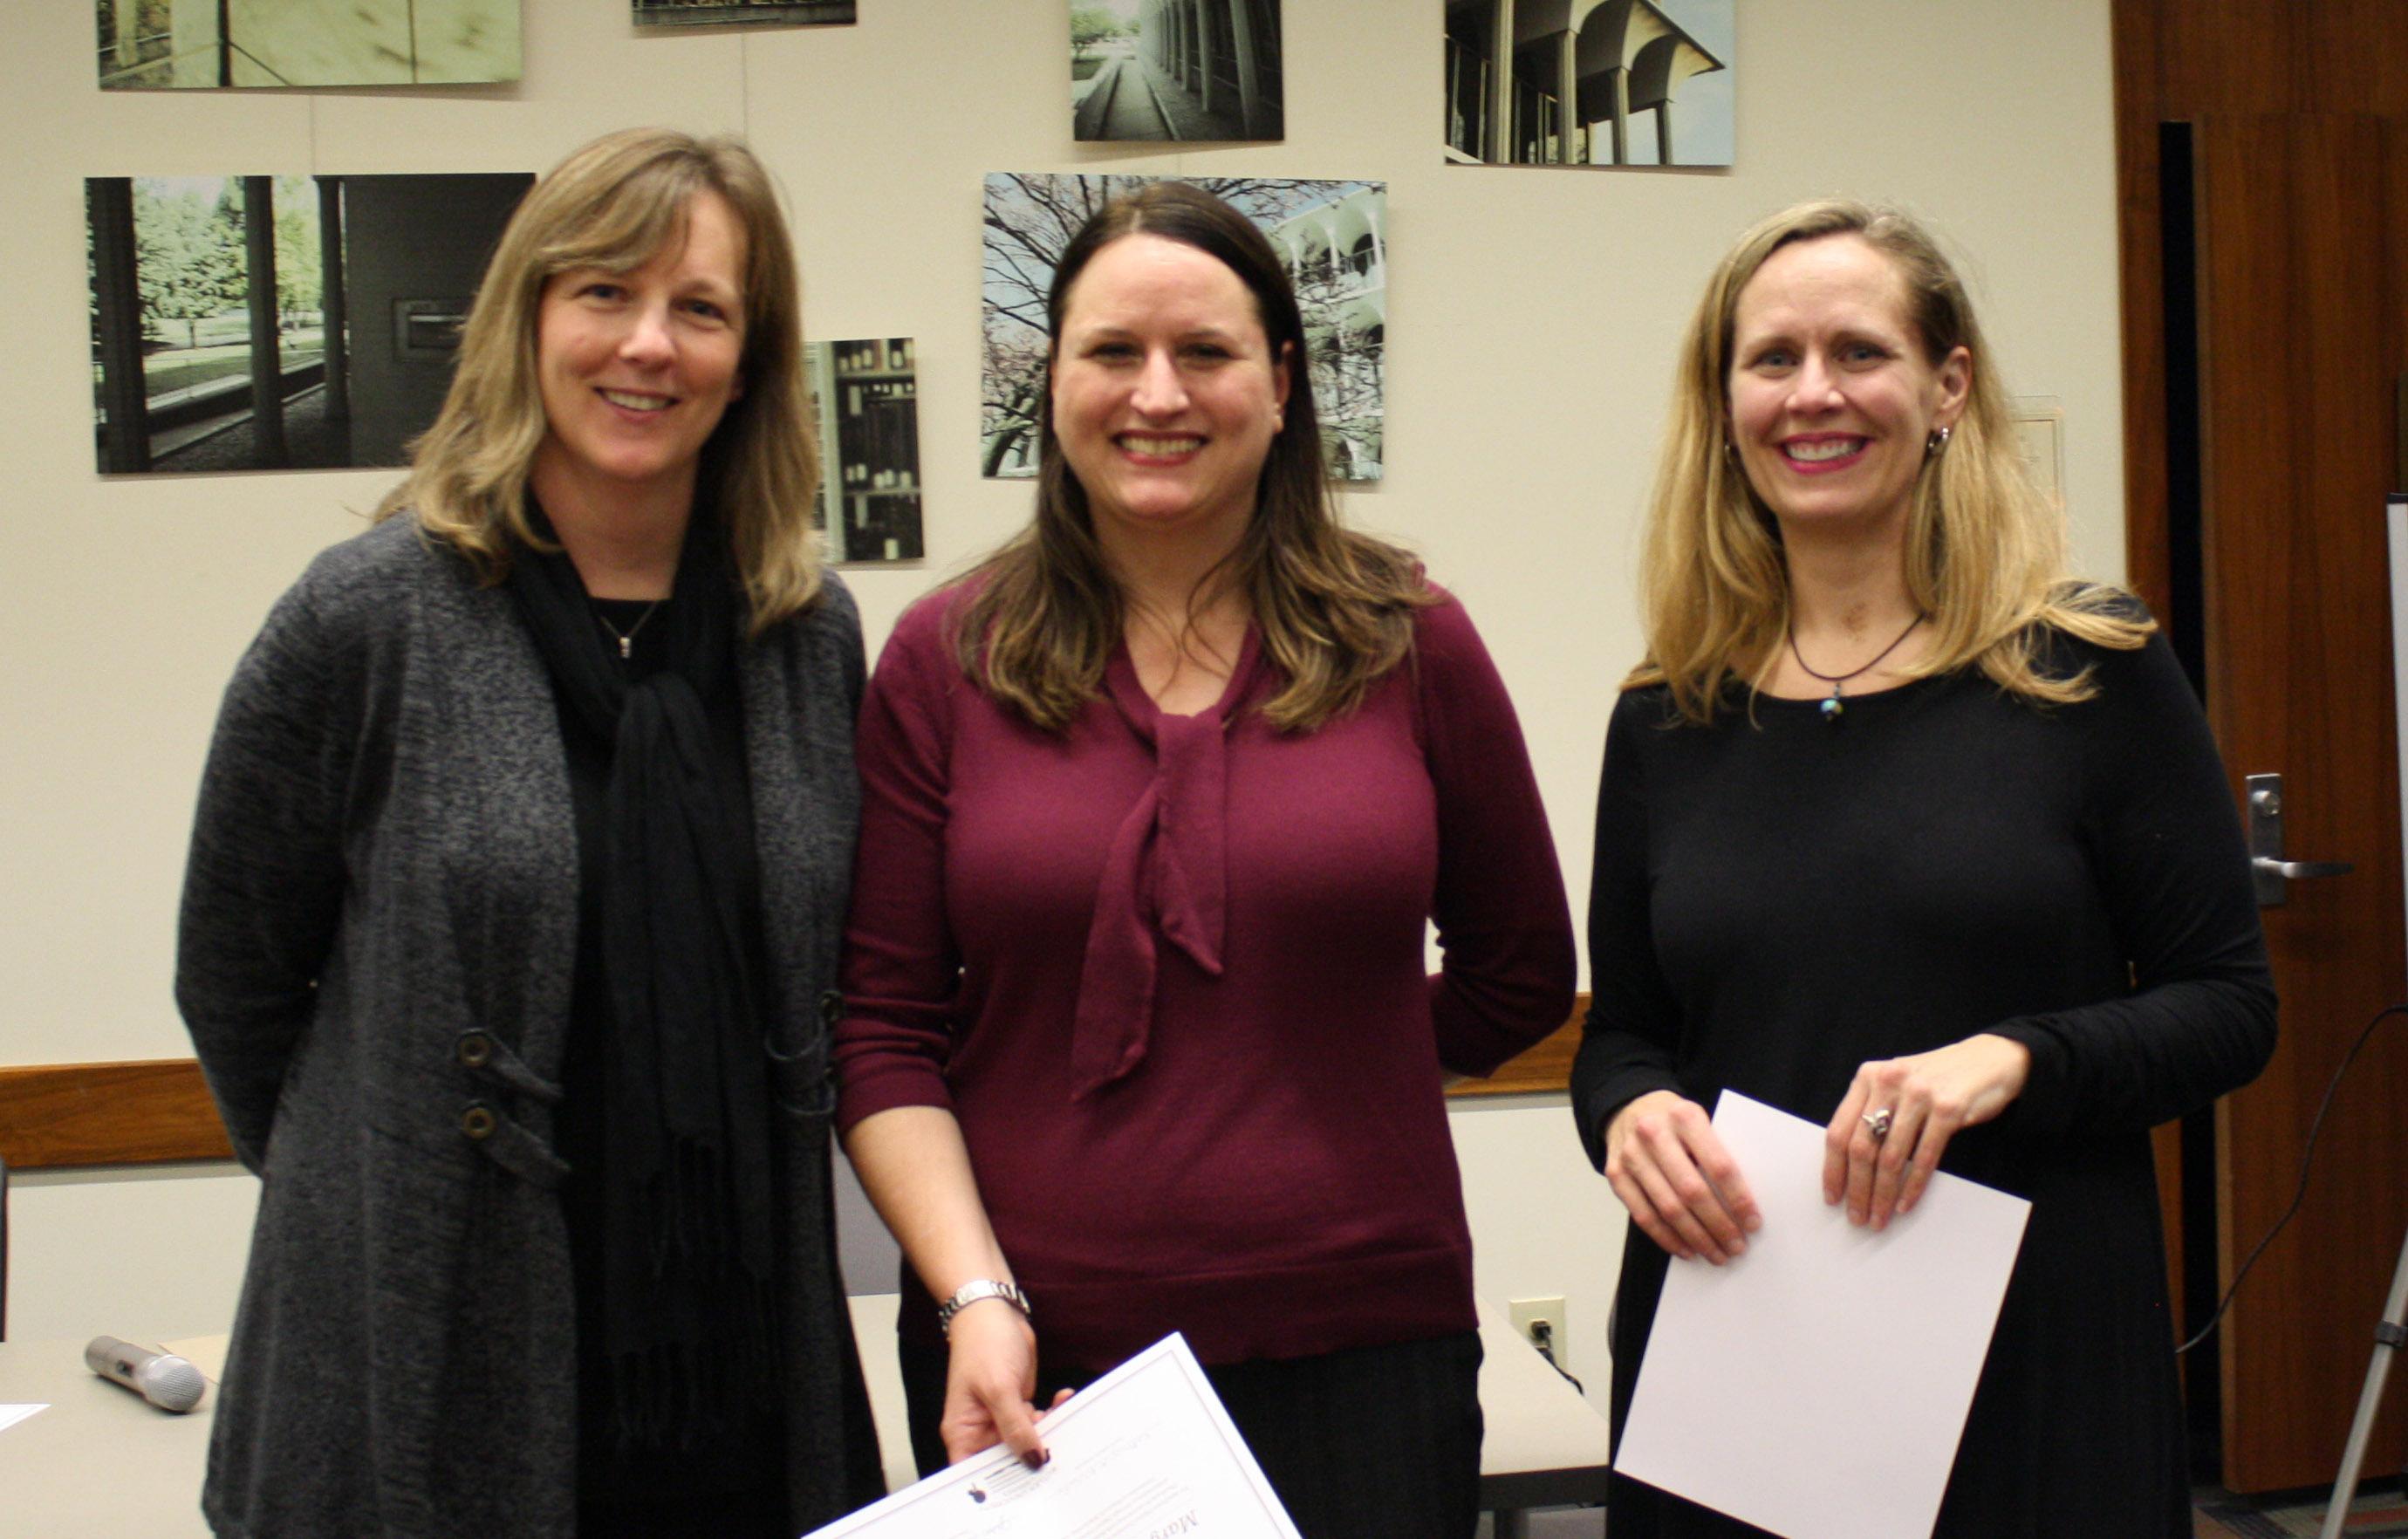 Celebration Certificate Recipients - CCOM faculty